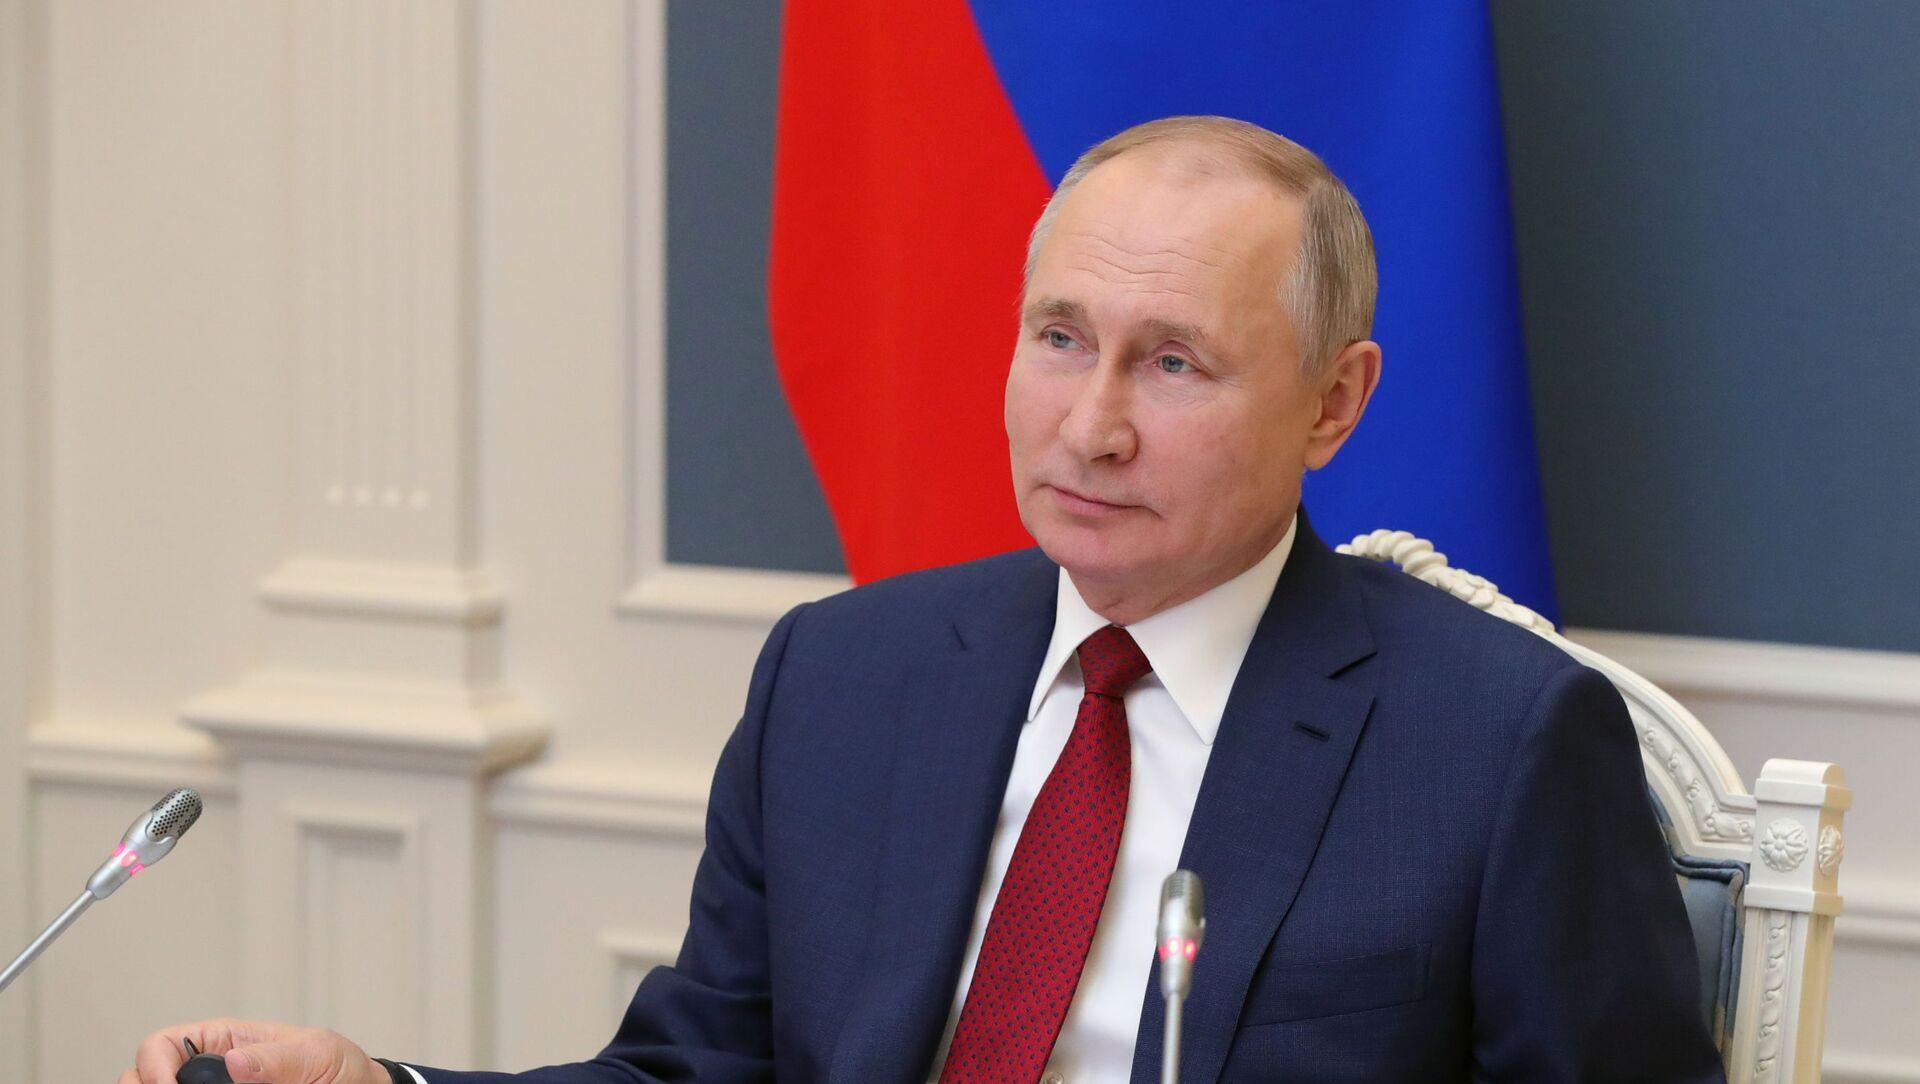 Президент РФ В. Путин выступил на сессии онлайн-форума Давосская повестка дня 2021 - Sputnik Азербайджан, 1920, 09.08.2021